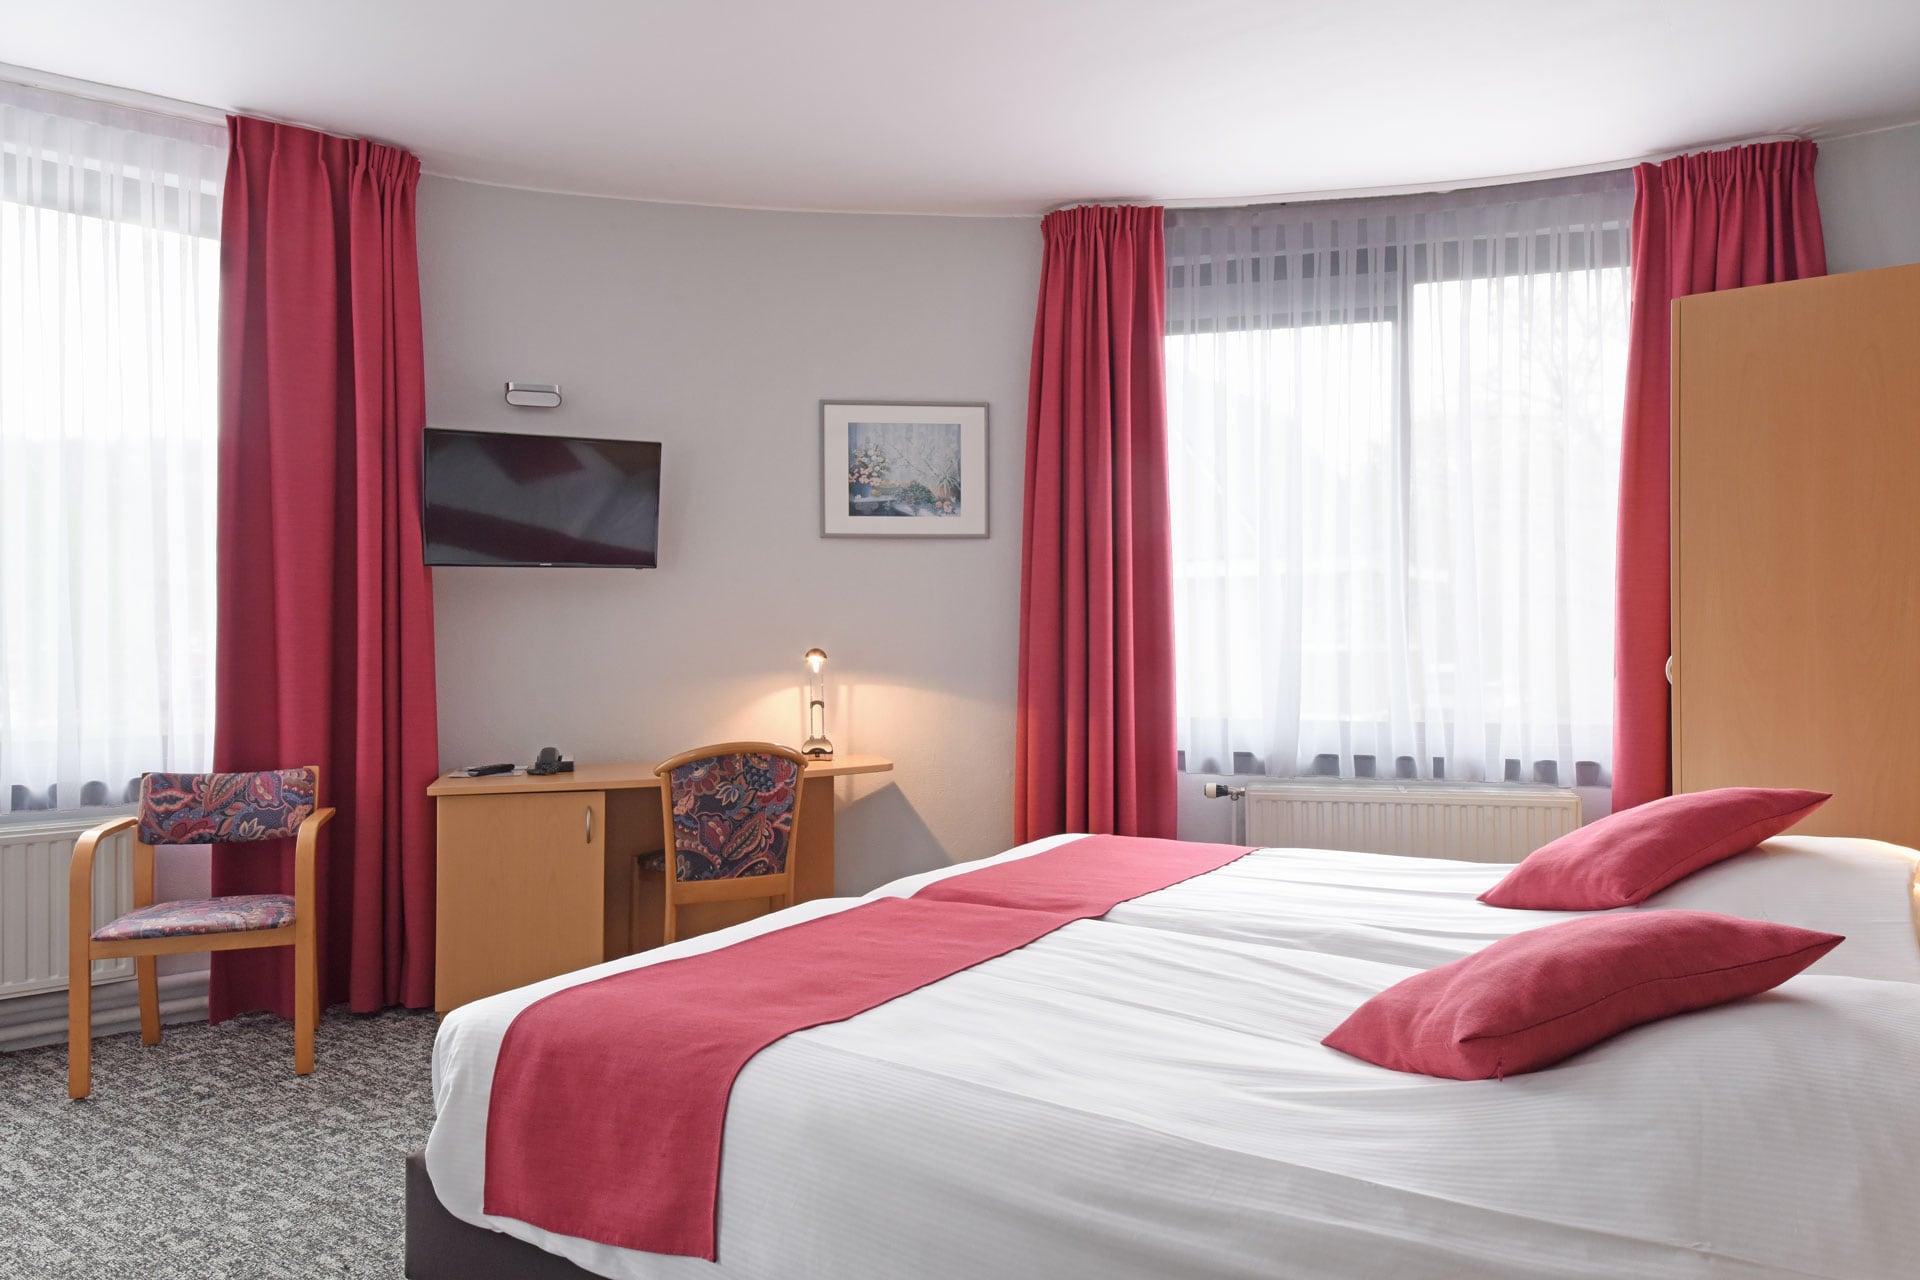 Hôtel - Limburgia